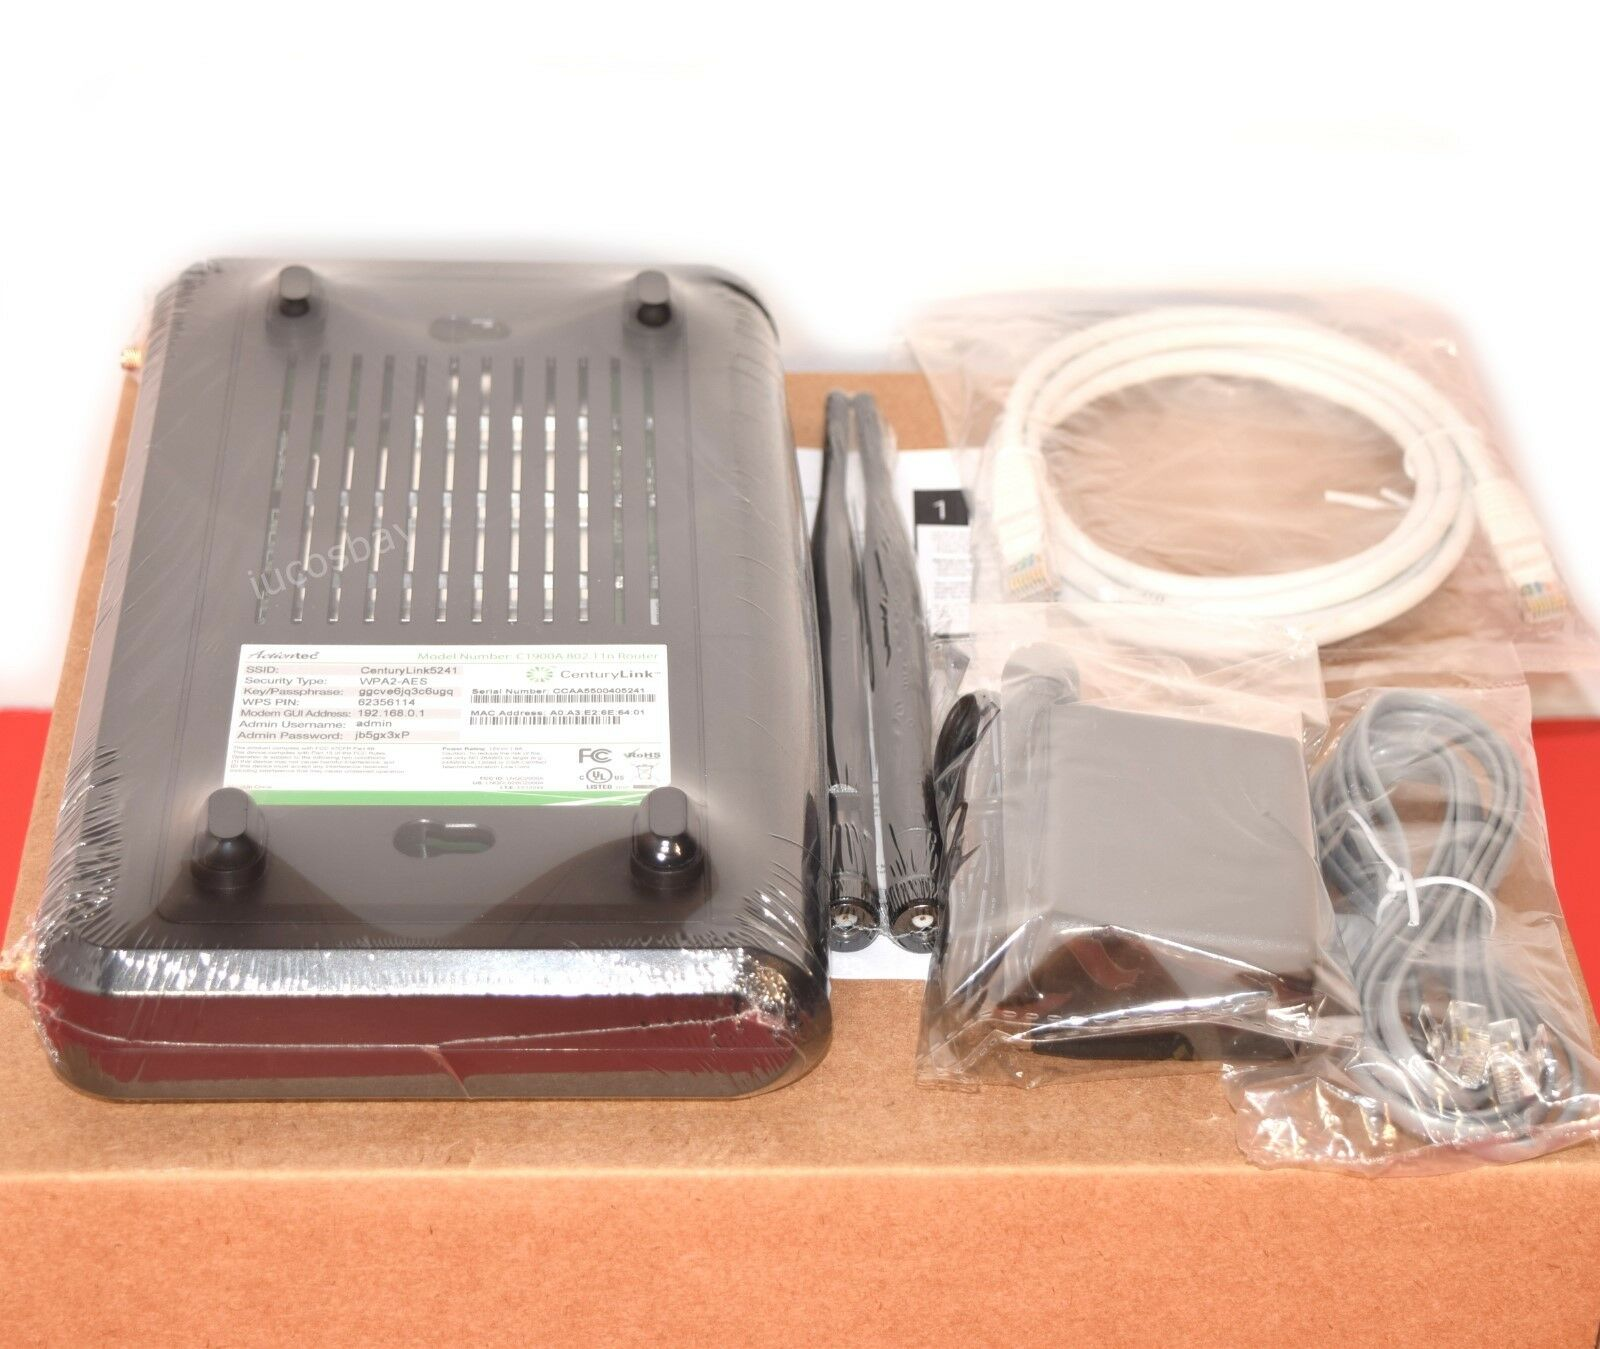 CenturyLink Actiontec C1900A Wireless Vdsl2 IPTV Router